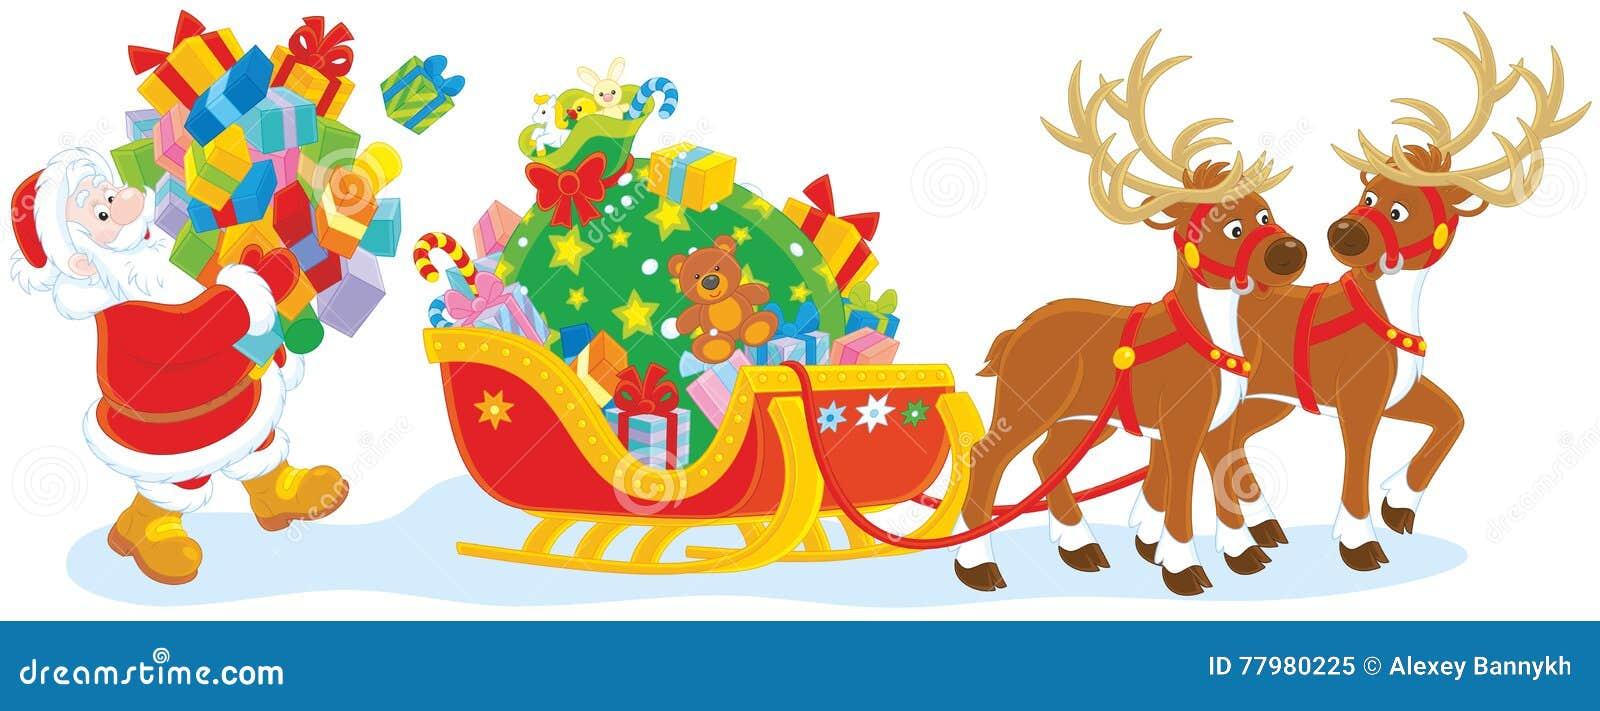 santa loading gifts stock vector image of santa  sledge santa in his sleigh clipart free santa in sleigh clipart